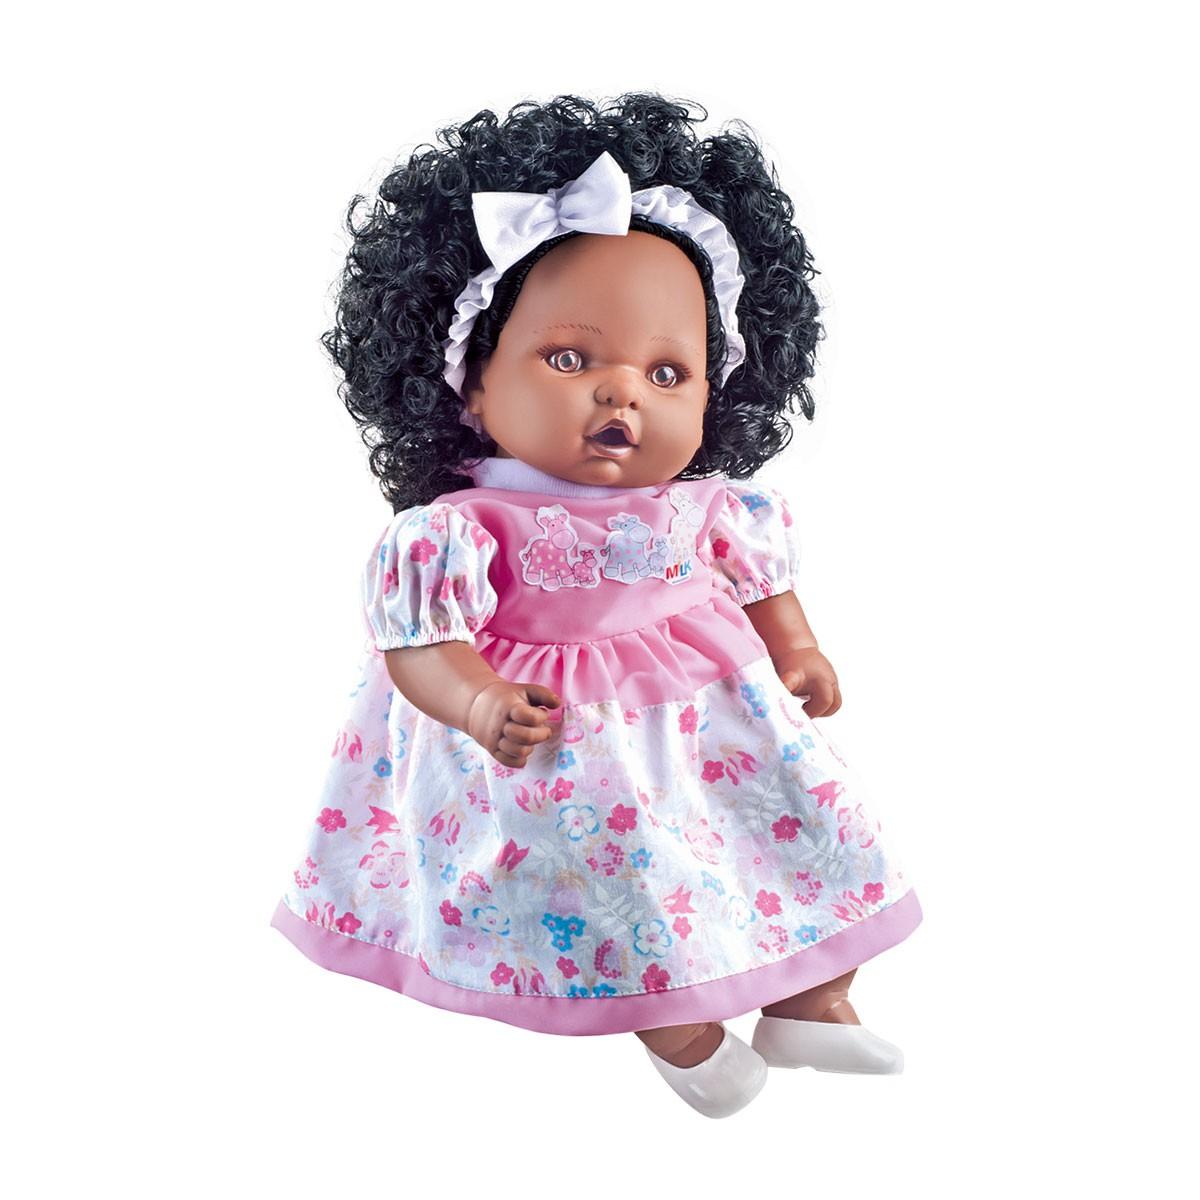 Boneca Collezione Angelina Negra Fala 62 Frases 48Cm Milk